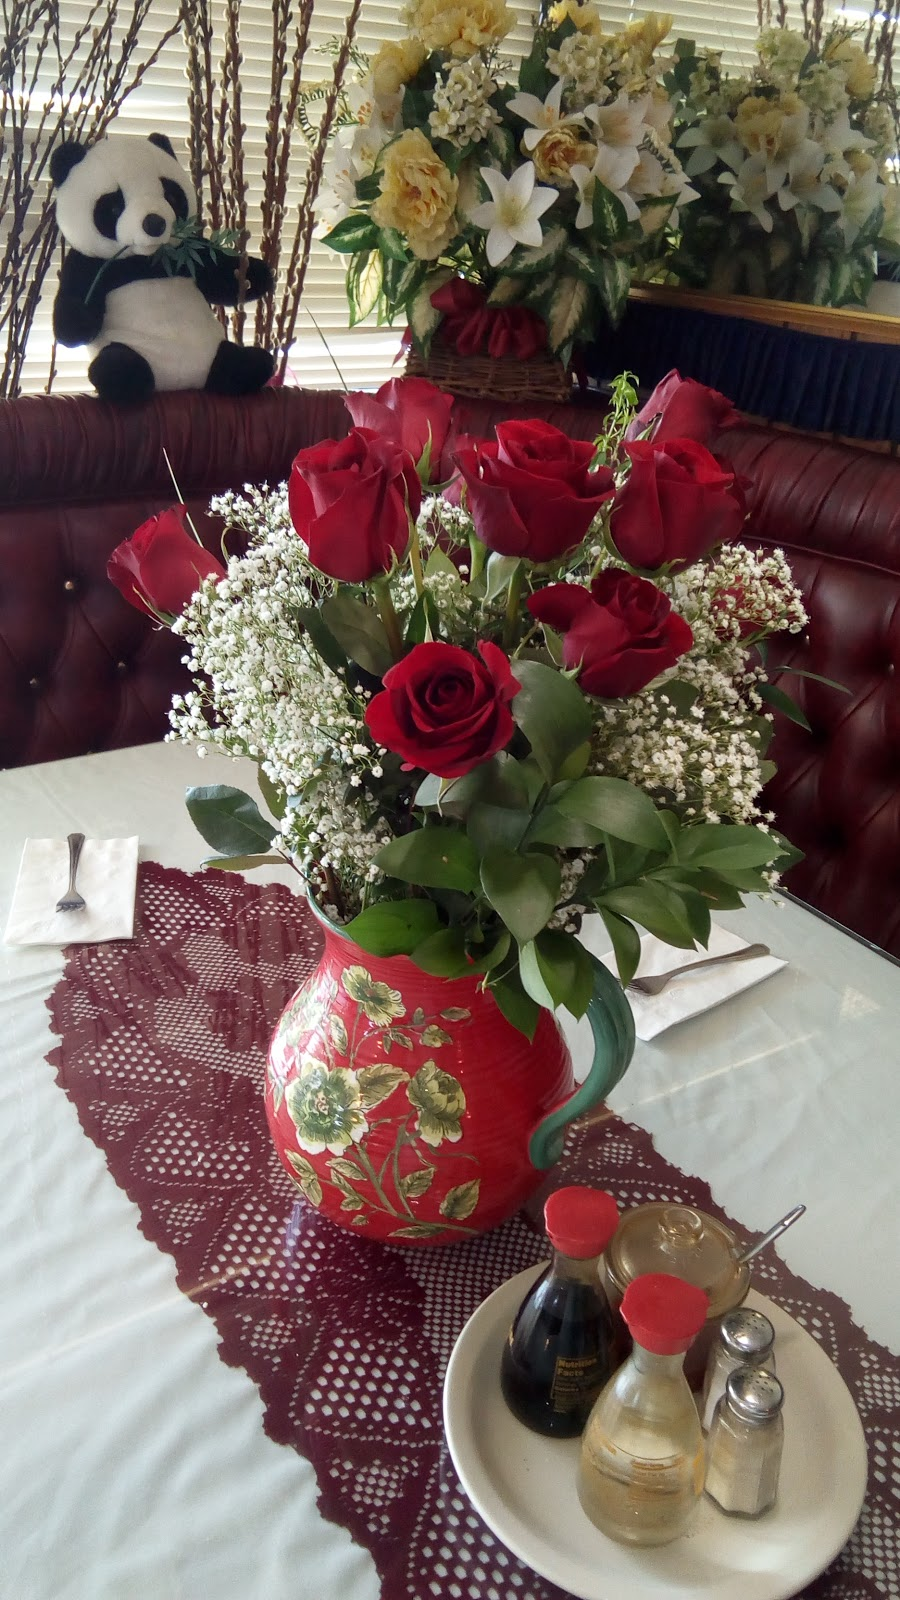 Peking Restaurant - restaurant  | Photo 4 of 10 | Address: 9529 Folsom Blvd, Sacramento, CA 95827, USA | Phone: (916) 363-3959